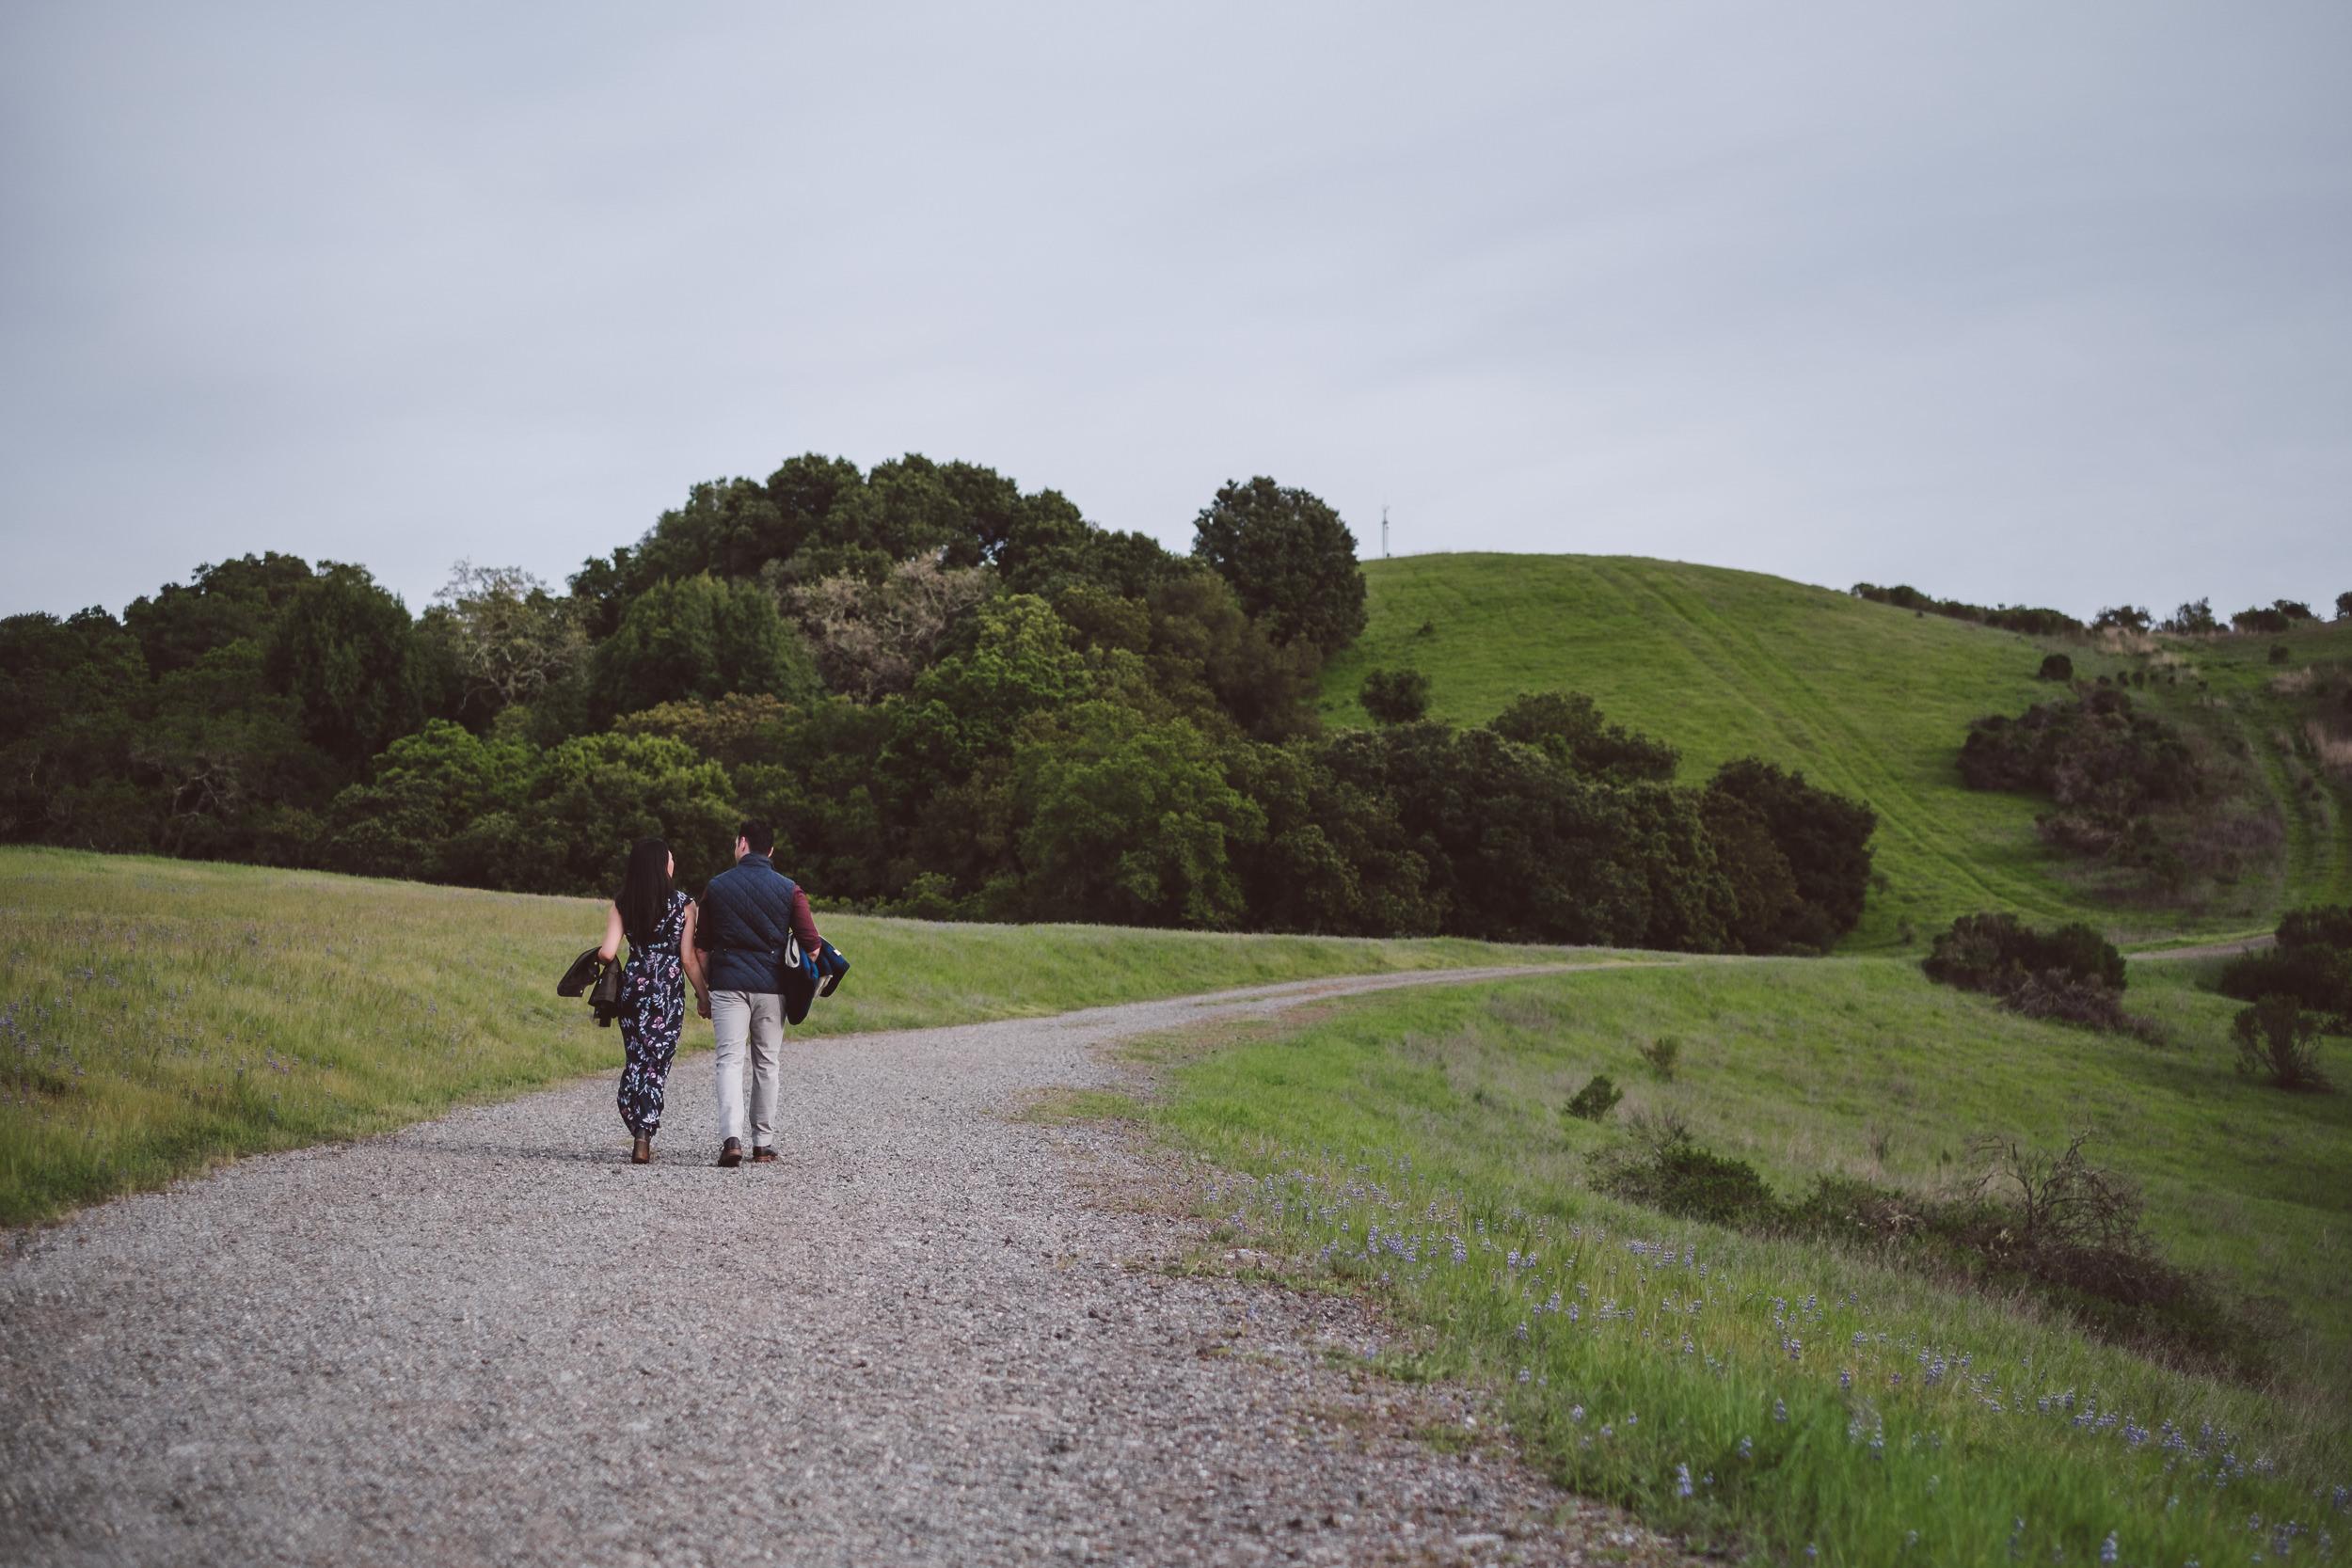 Palo-Alto-Foothills-Park-Engagement-Photography-019.jpg